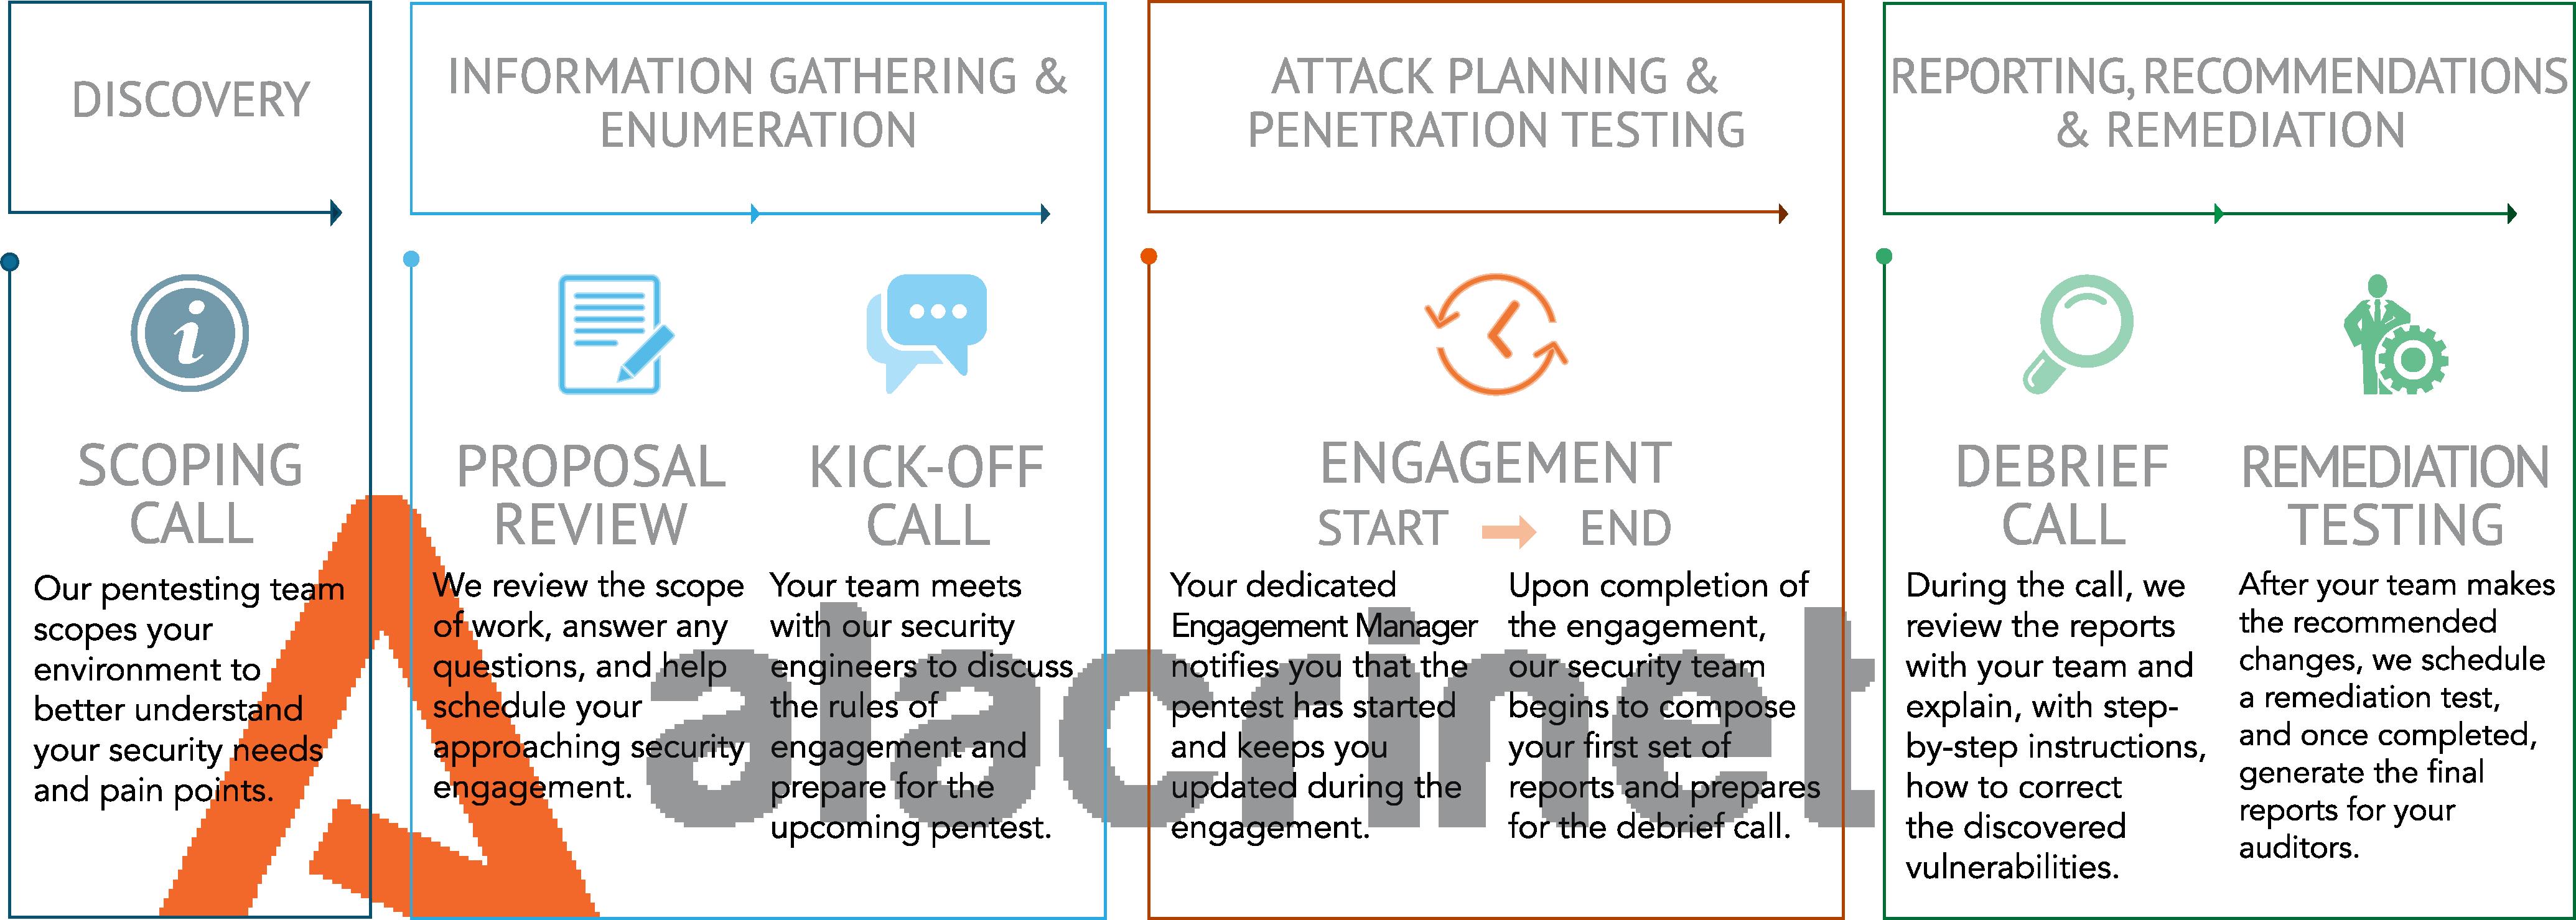 Alacrinet Penetration Testing Timeline